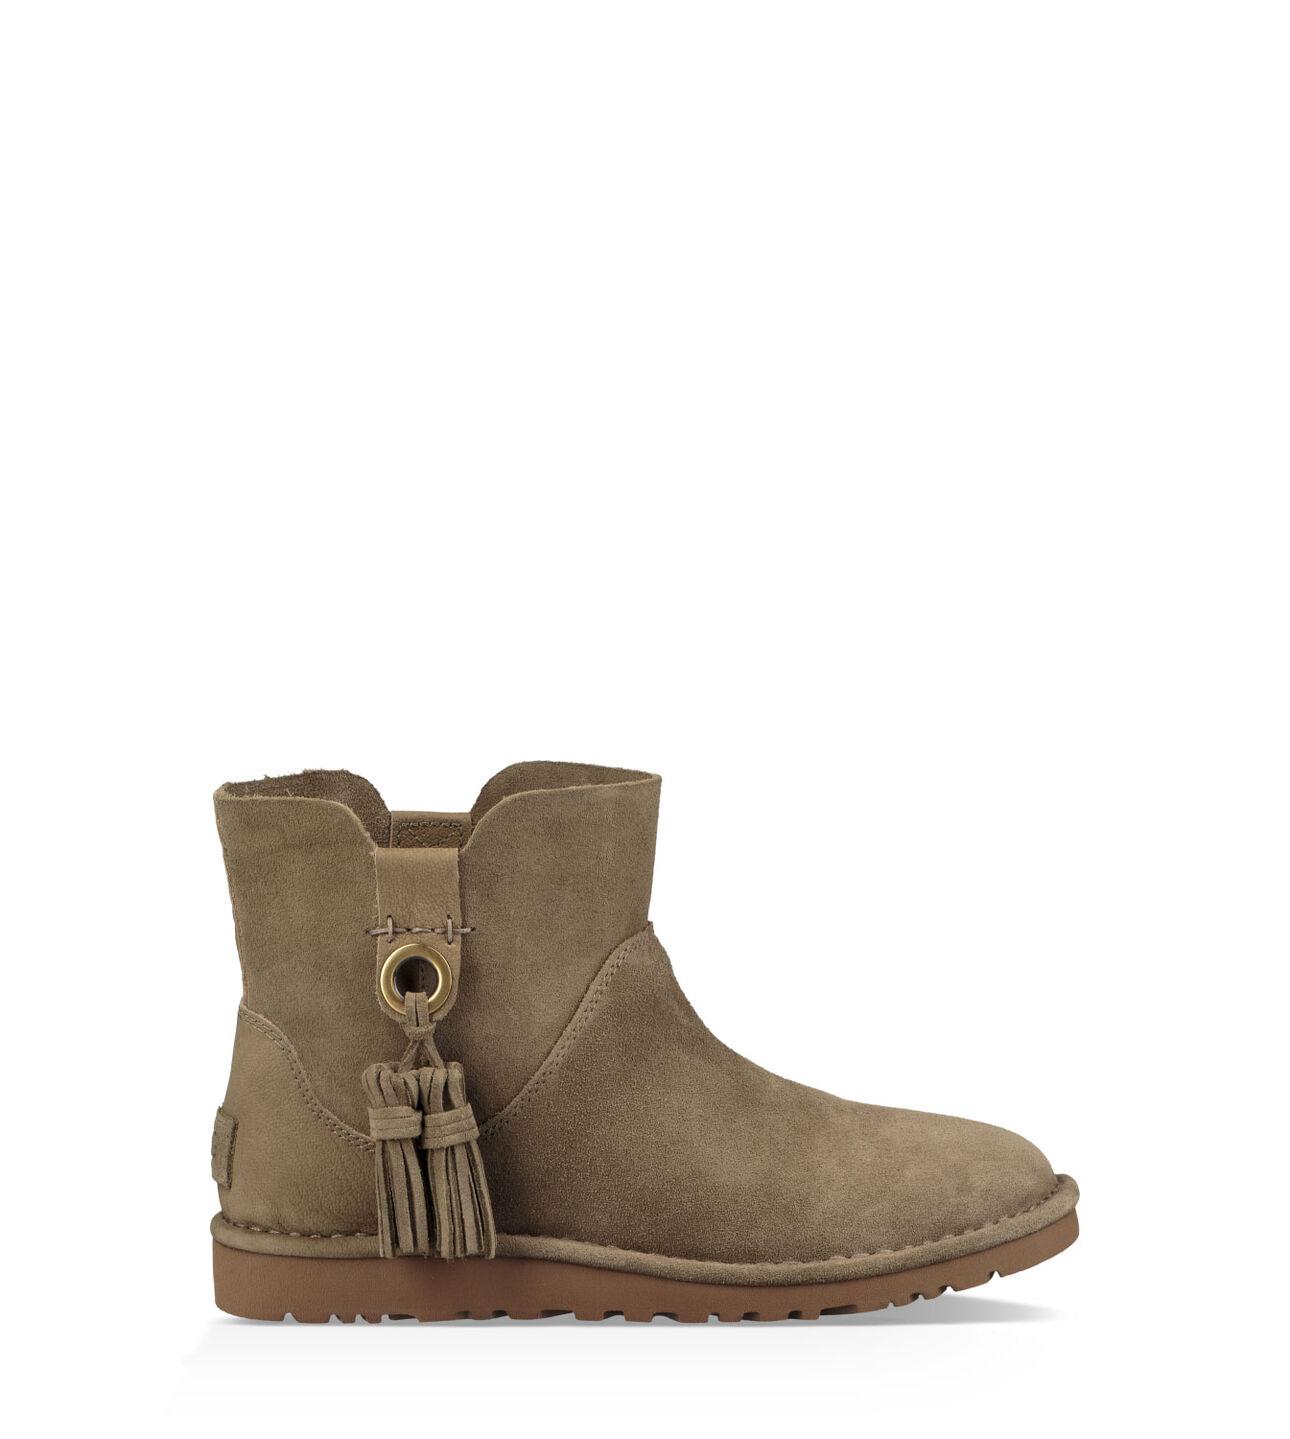 Ugg shoes Amazon. Showing 1–12 of 16 results. 1; 2 → UGG Women's W Scuffette II Slipper Sale! $ $ View On Amazon. UGG Women's Dakota $